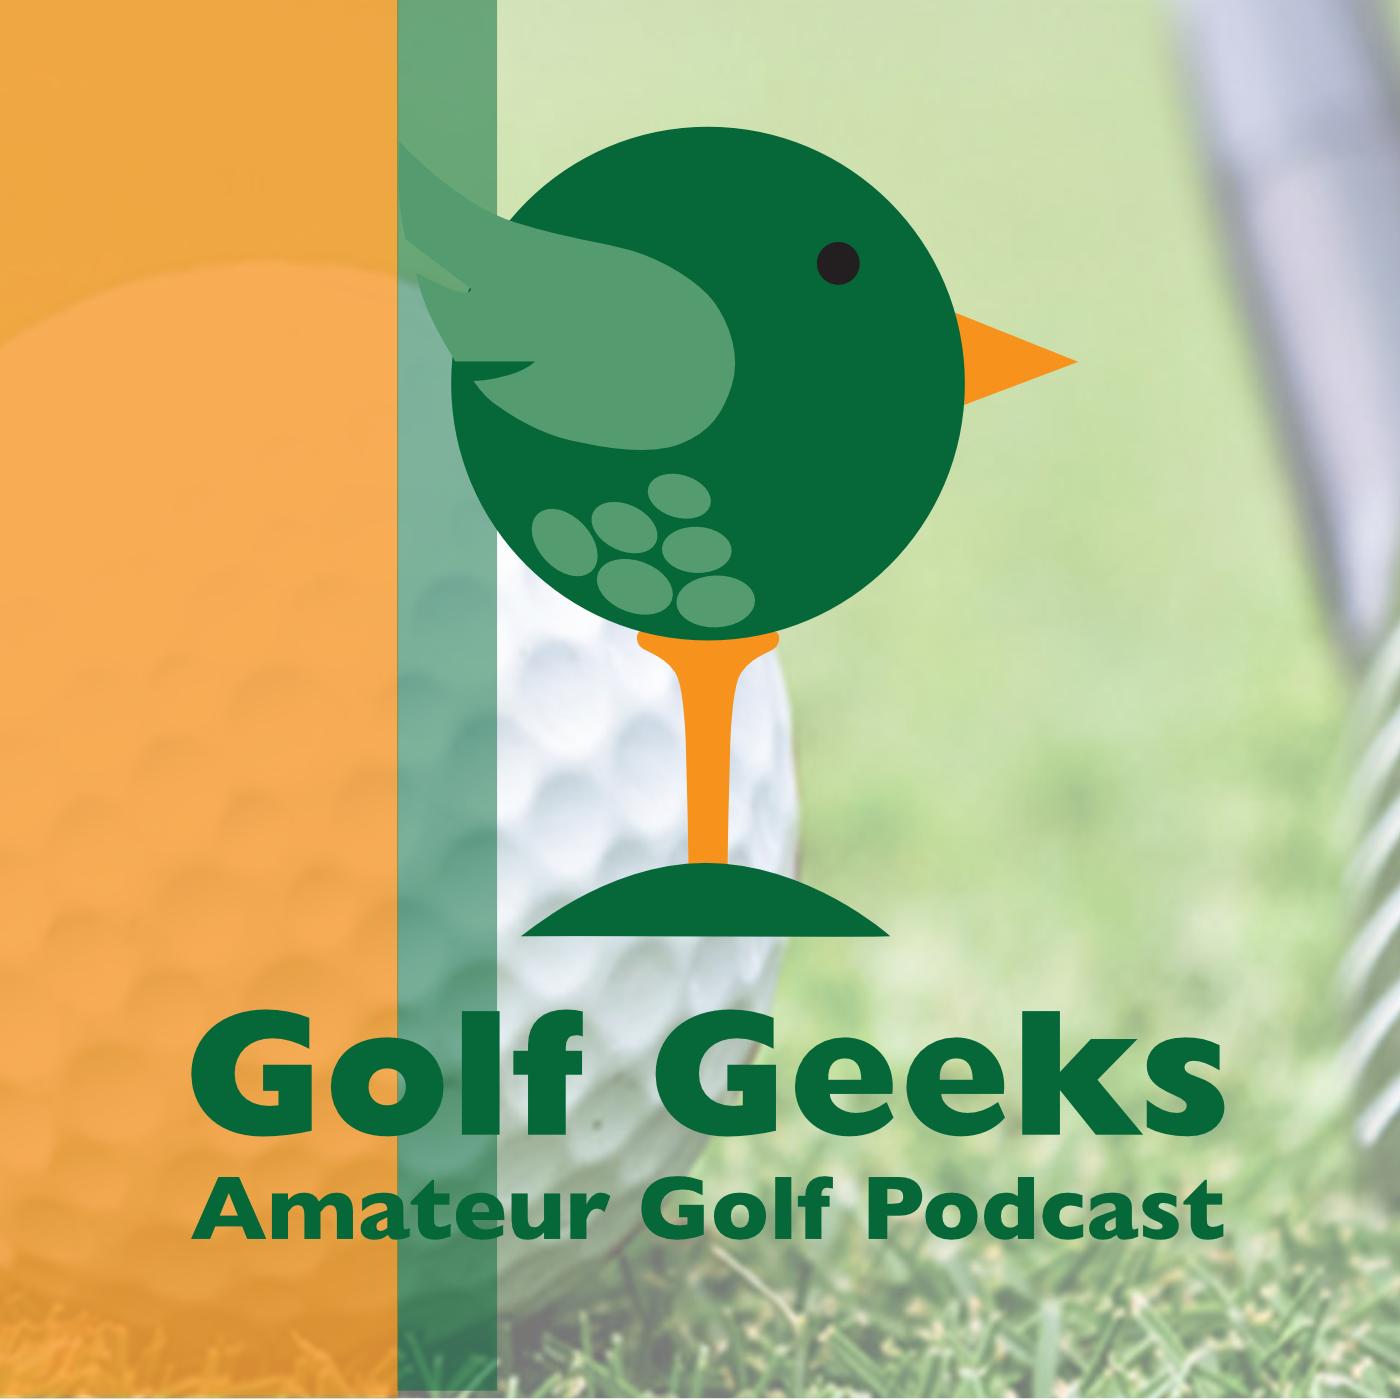 Golf Geeks Amateur Golfers Podcast show art